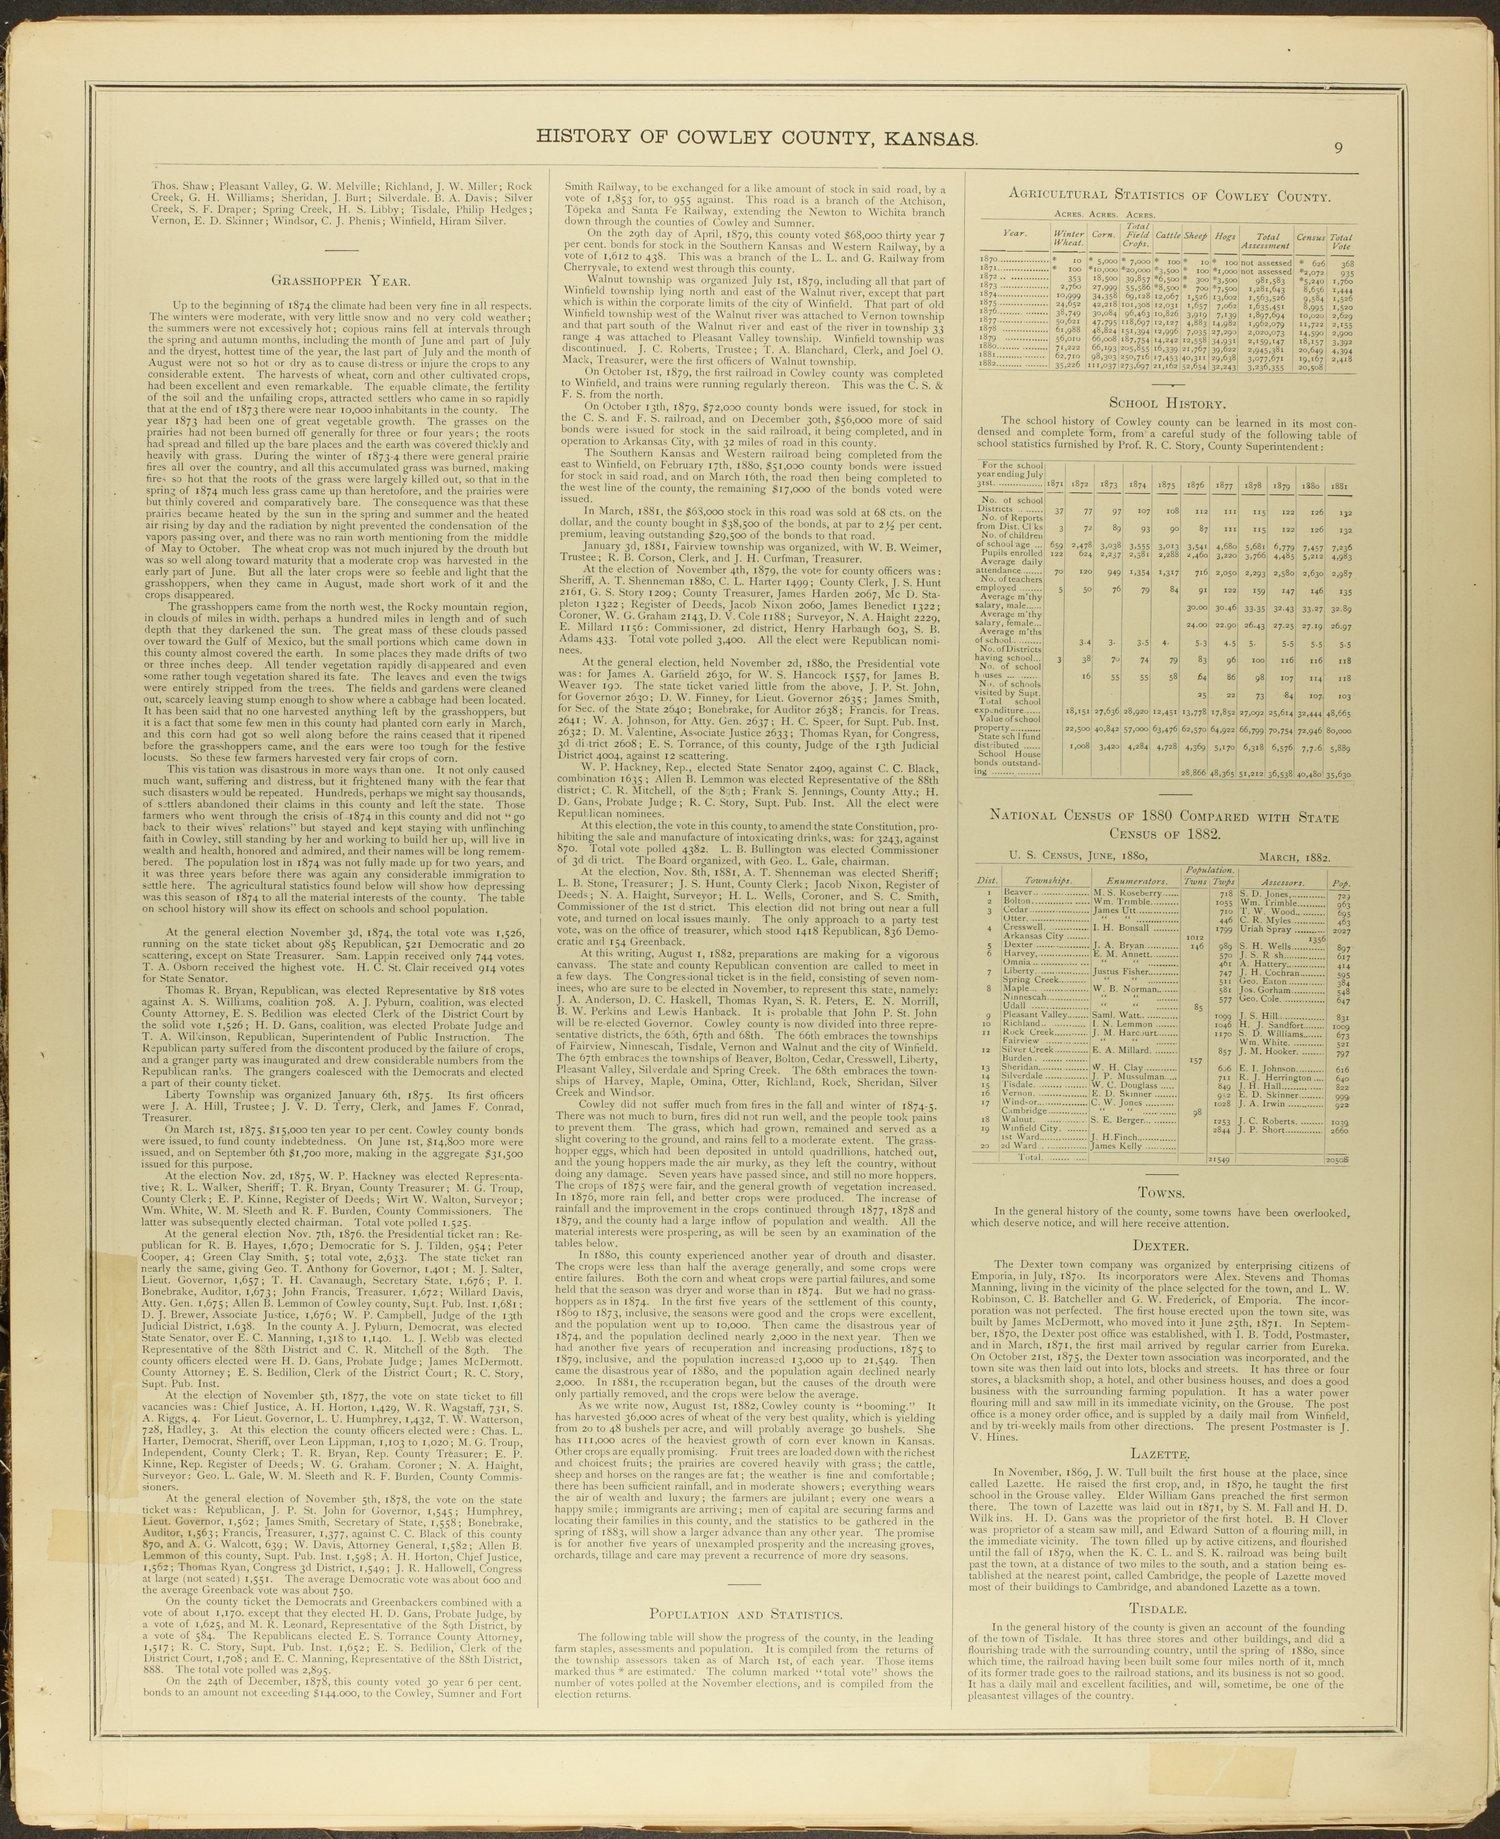 Historical atlas of Cowley County, Kansas - 9